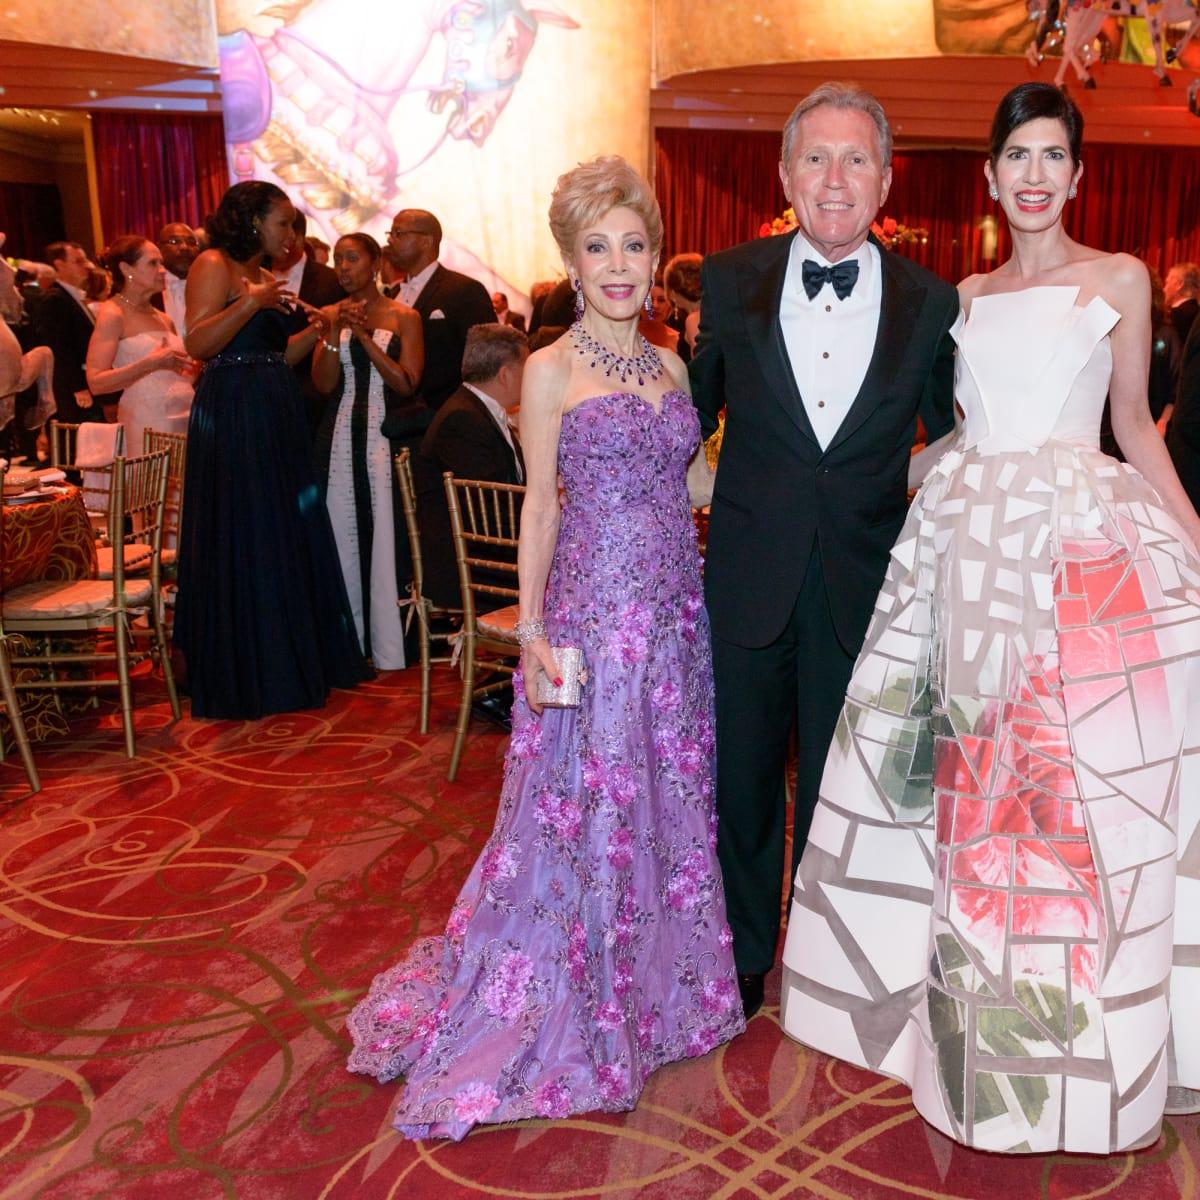 Houston Grand Opera Ball, April 2016 Margaret Alkek Williams, Martin Fein, Kelli Cohen Fein